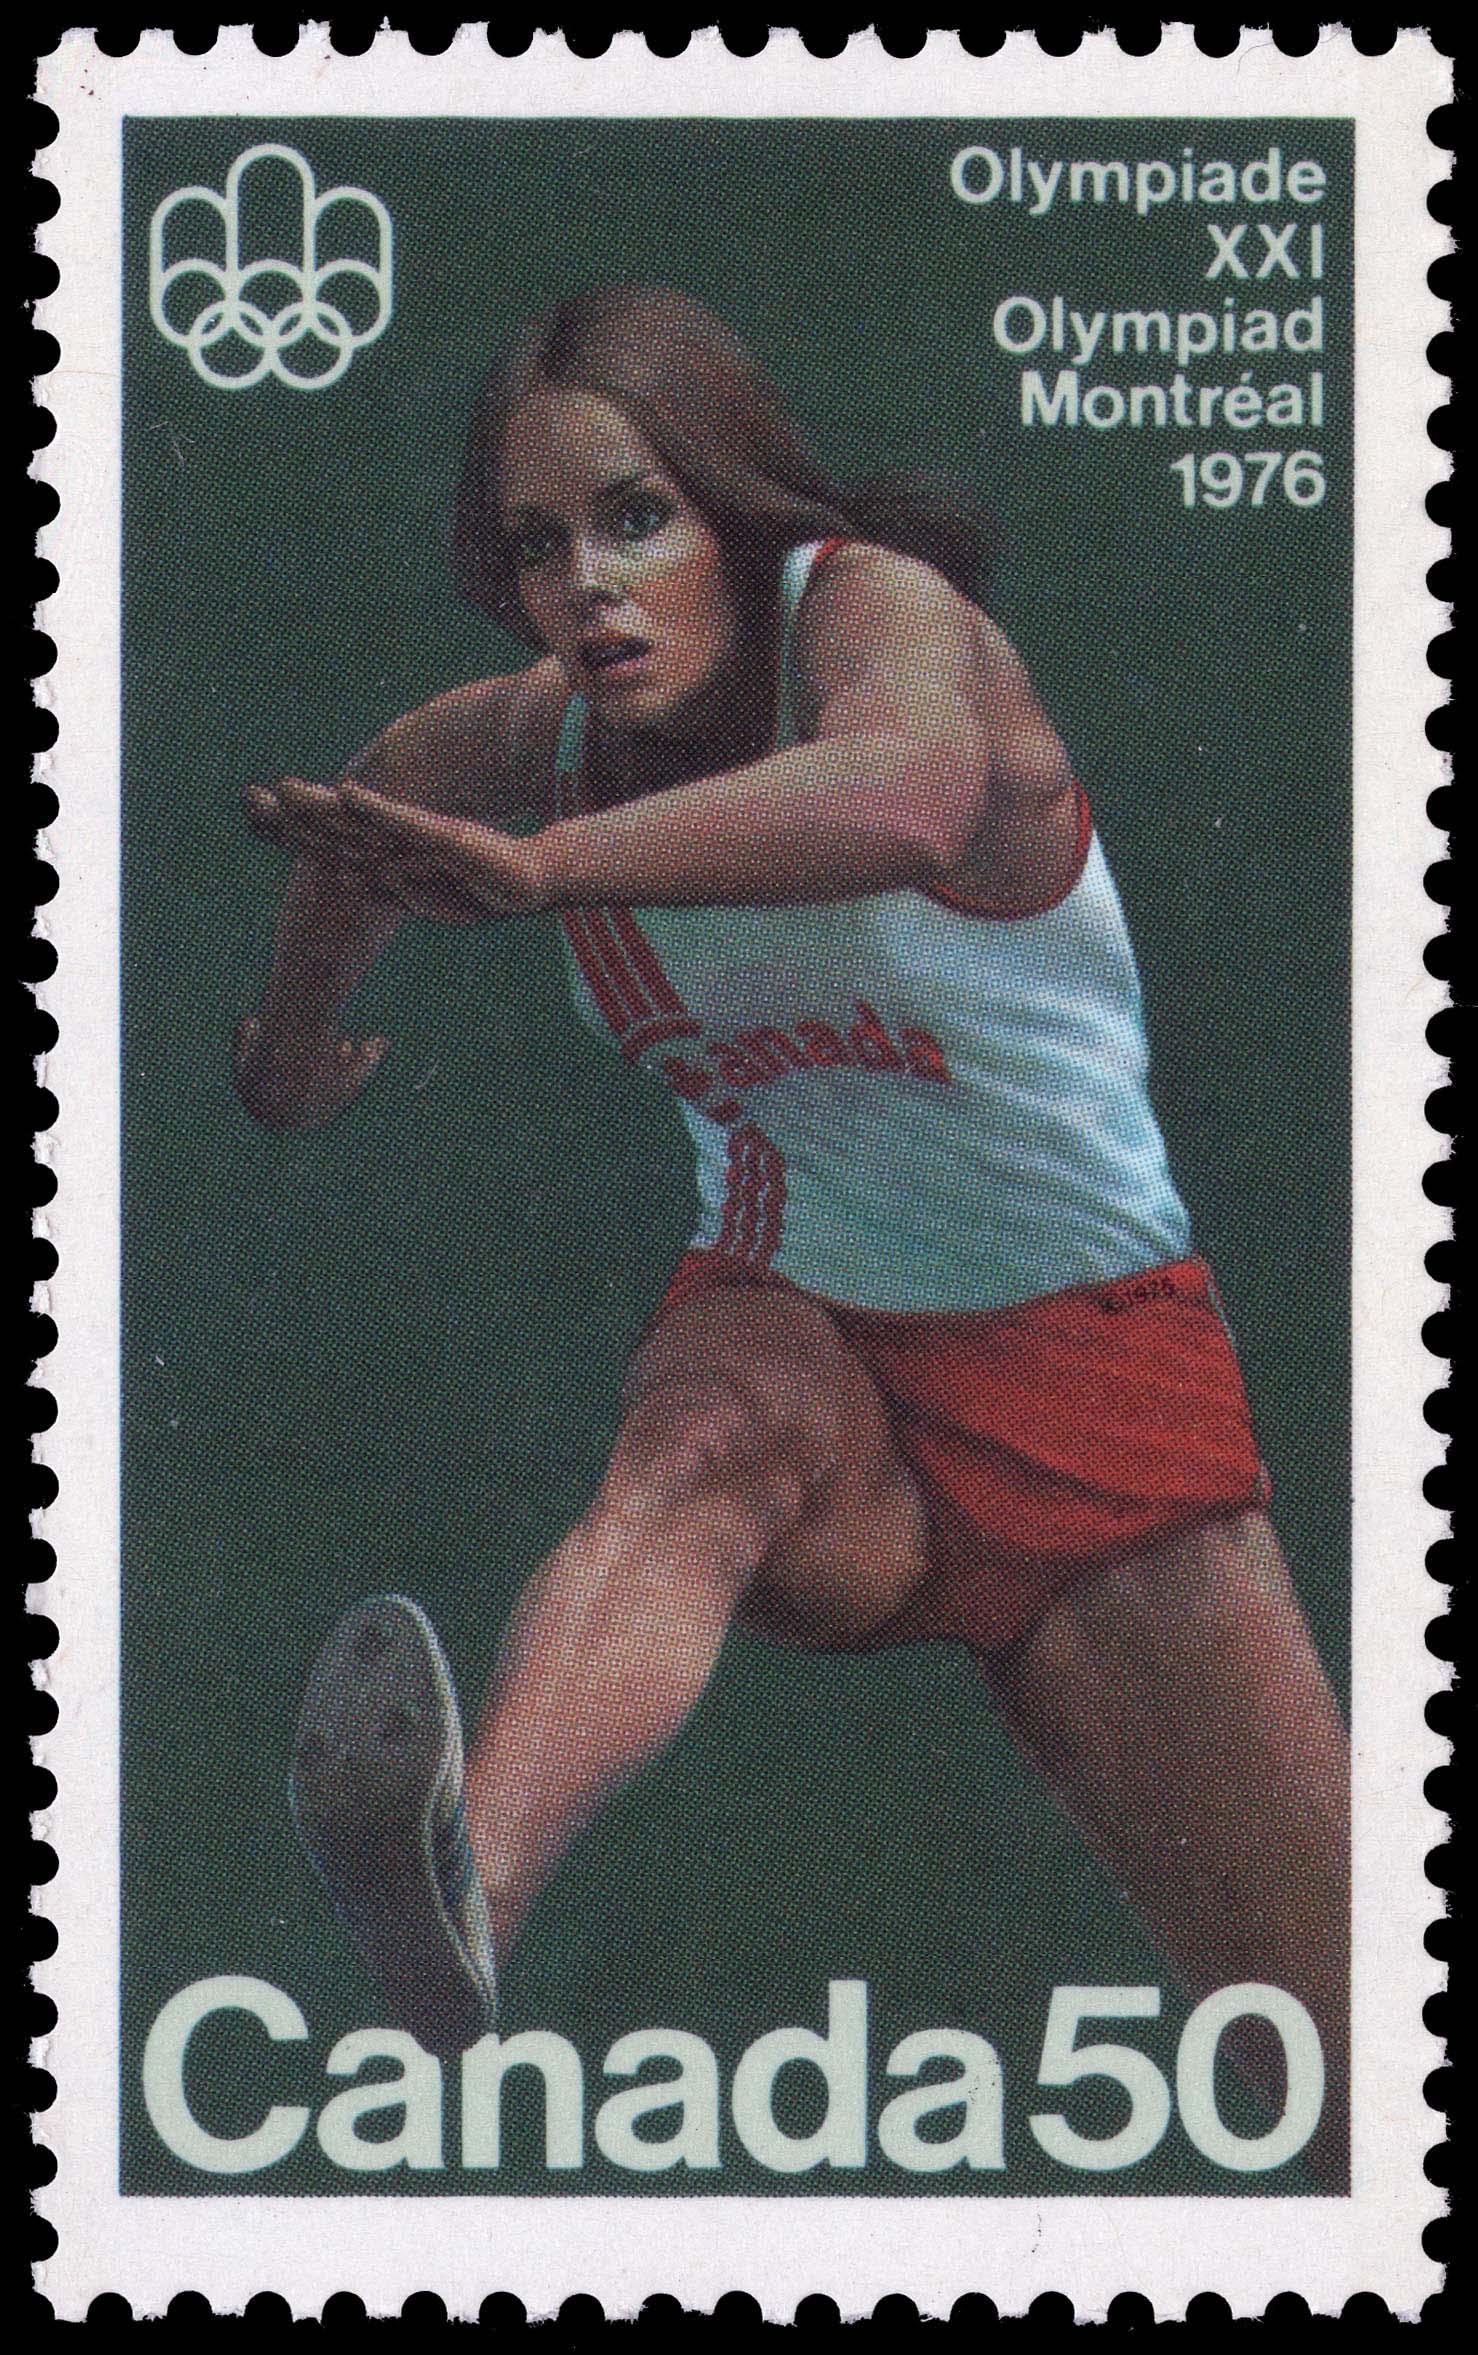 Hurdler Canada Postage Stamp